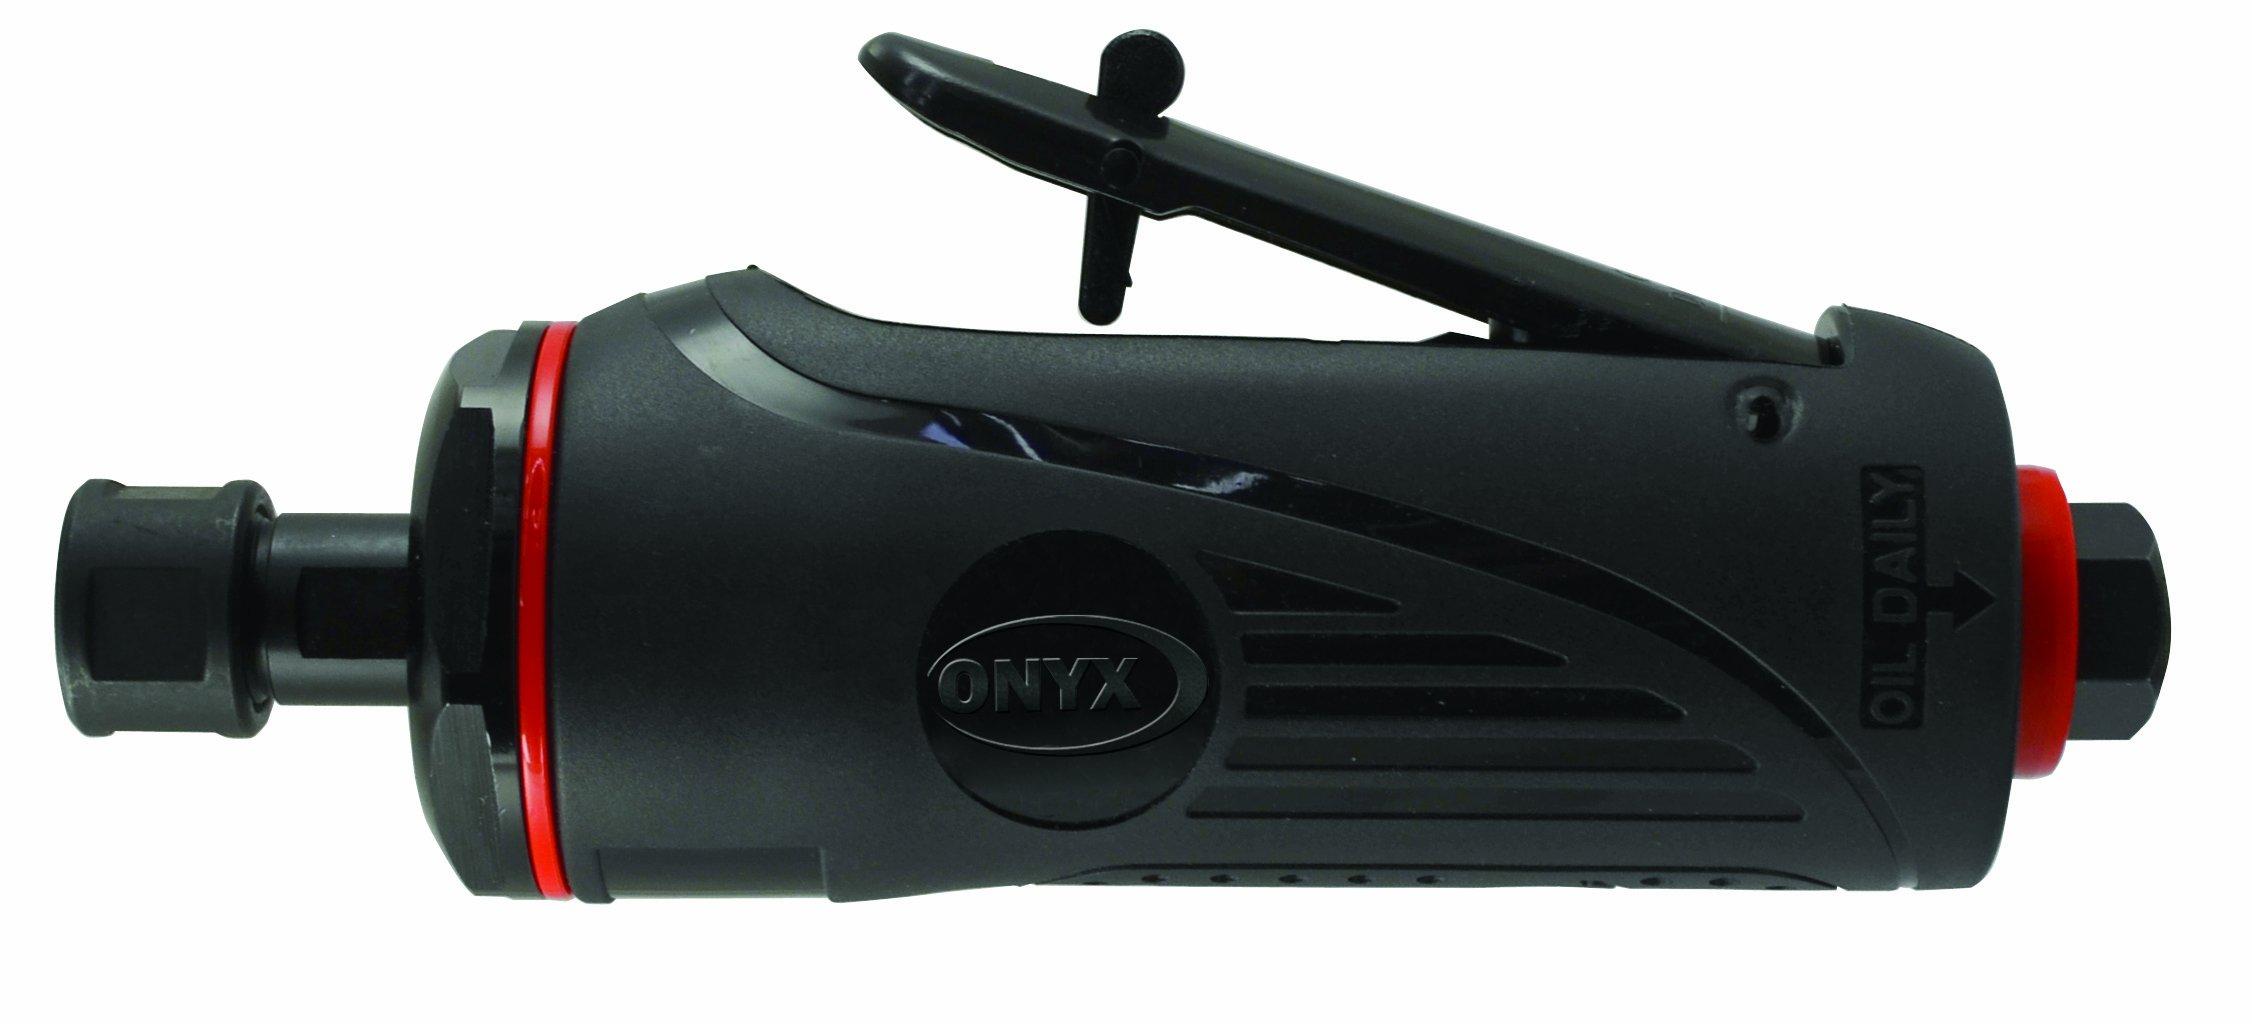 Astro 202 ONYX Composite 1/4-Inch Medium Die Grinder with Safety Lever